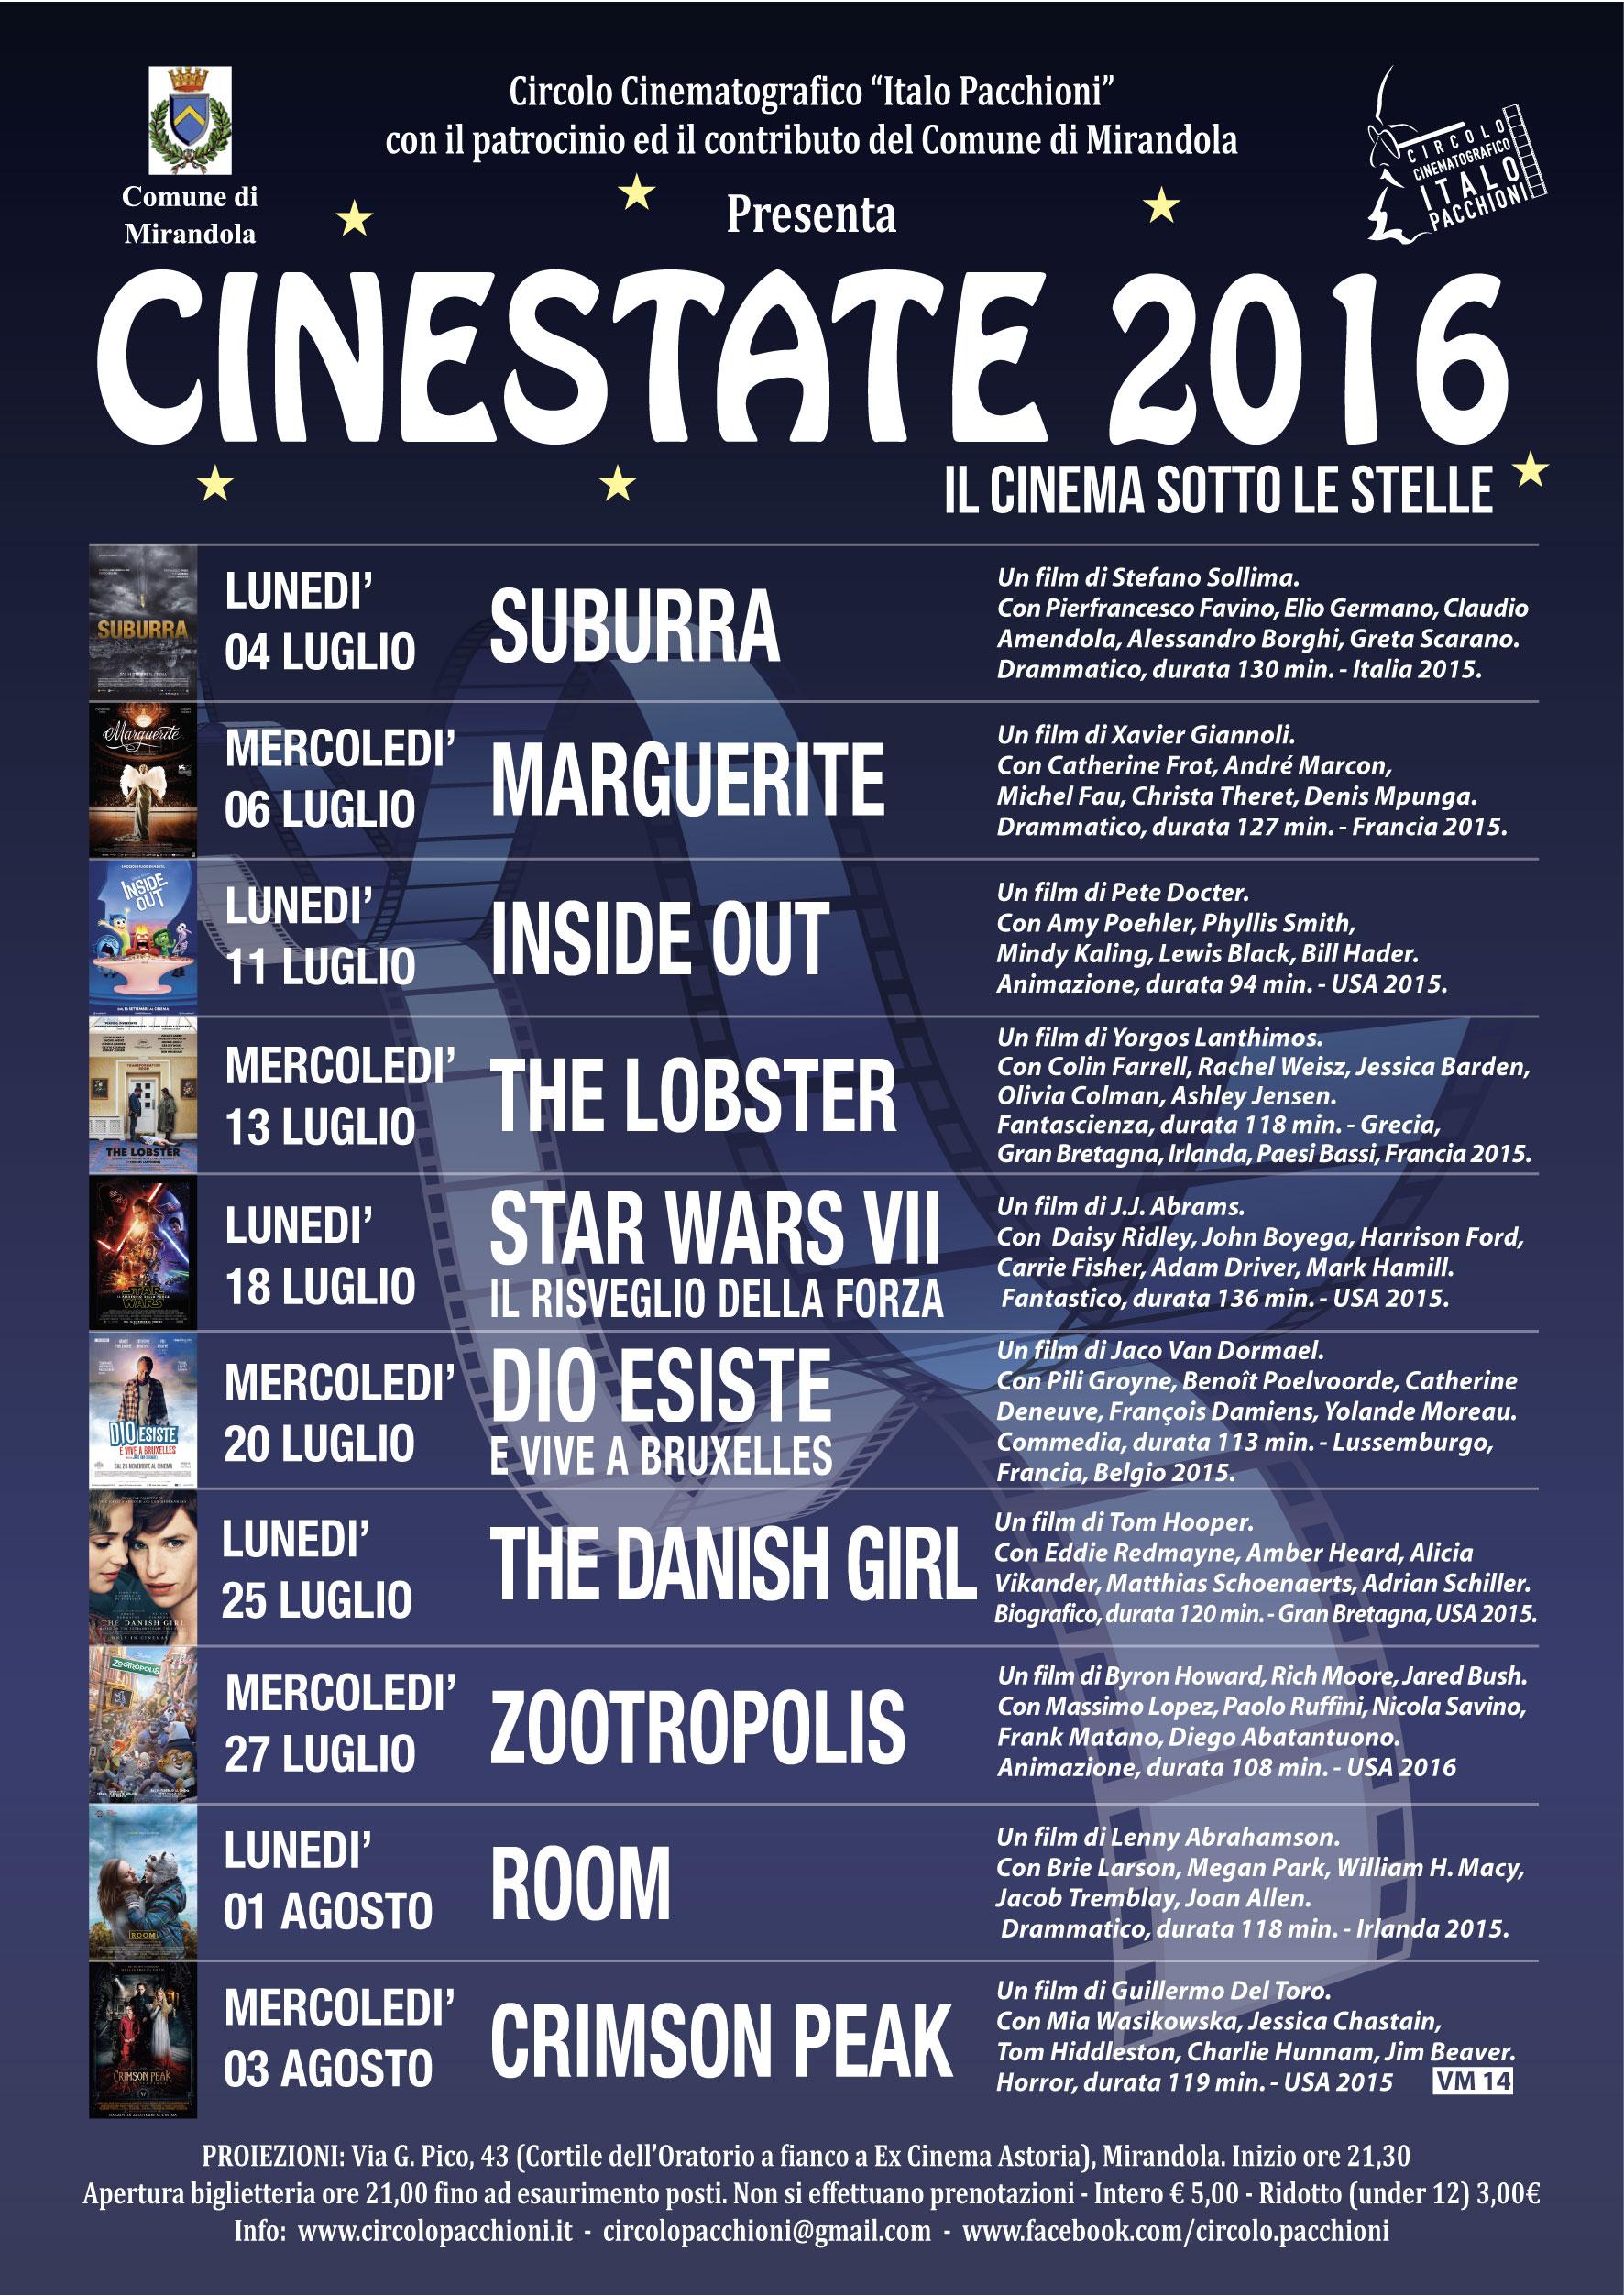 Locandina A5 Cinestate 2016 Mirandola